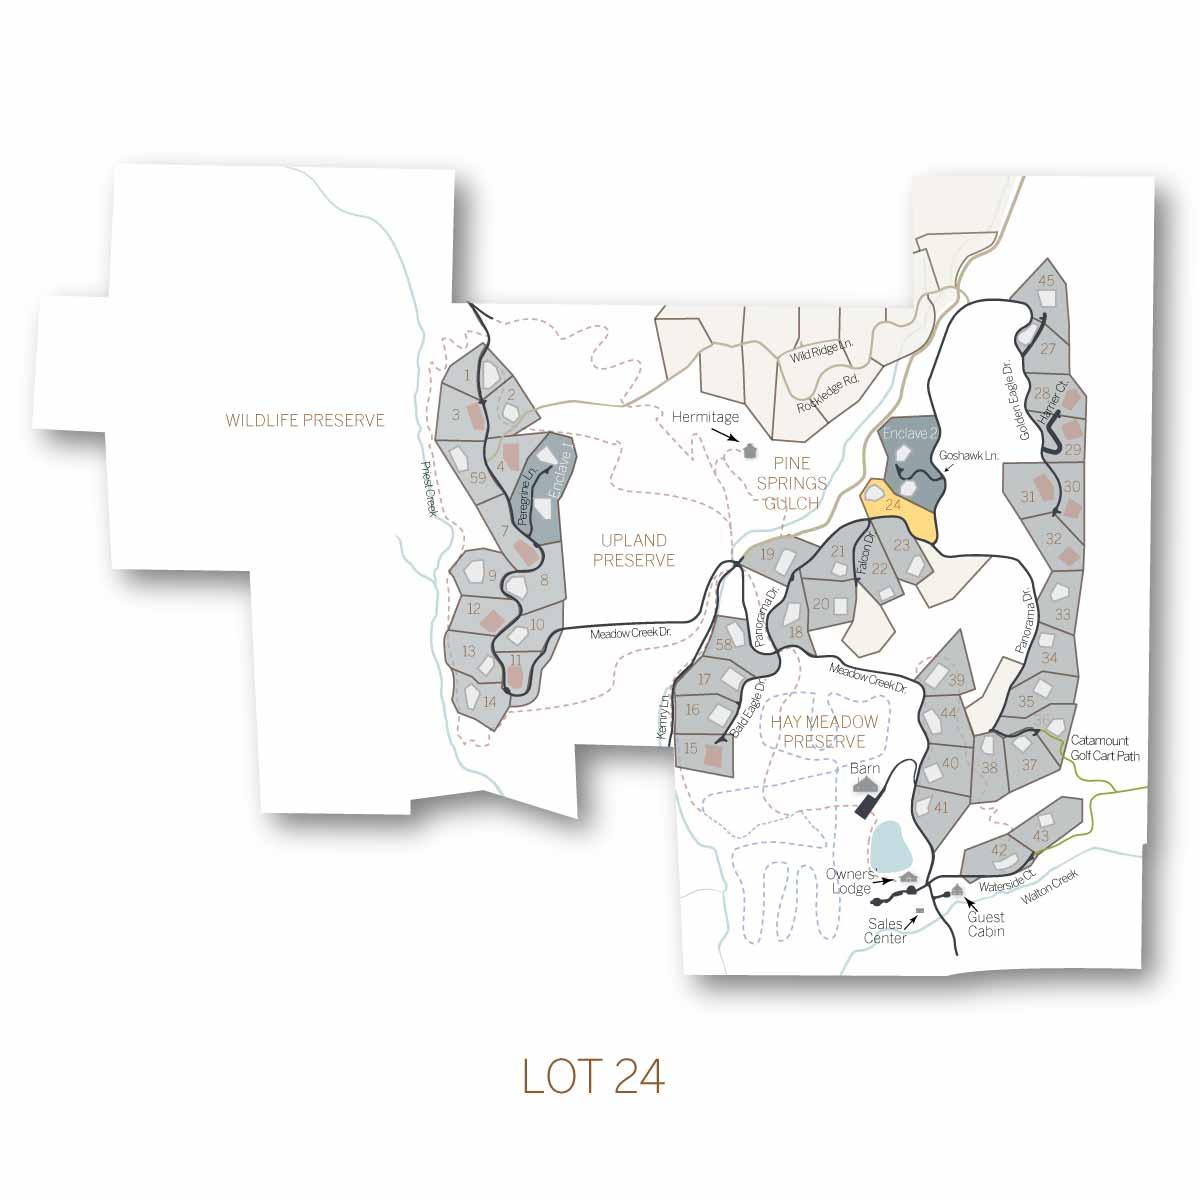 lot 24.1 - Homesite #24